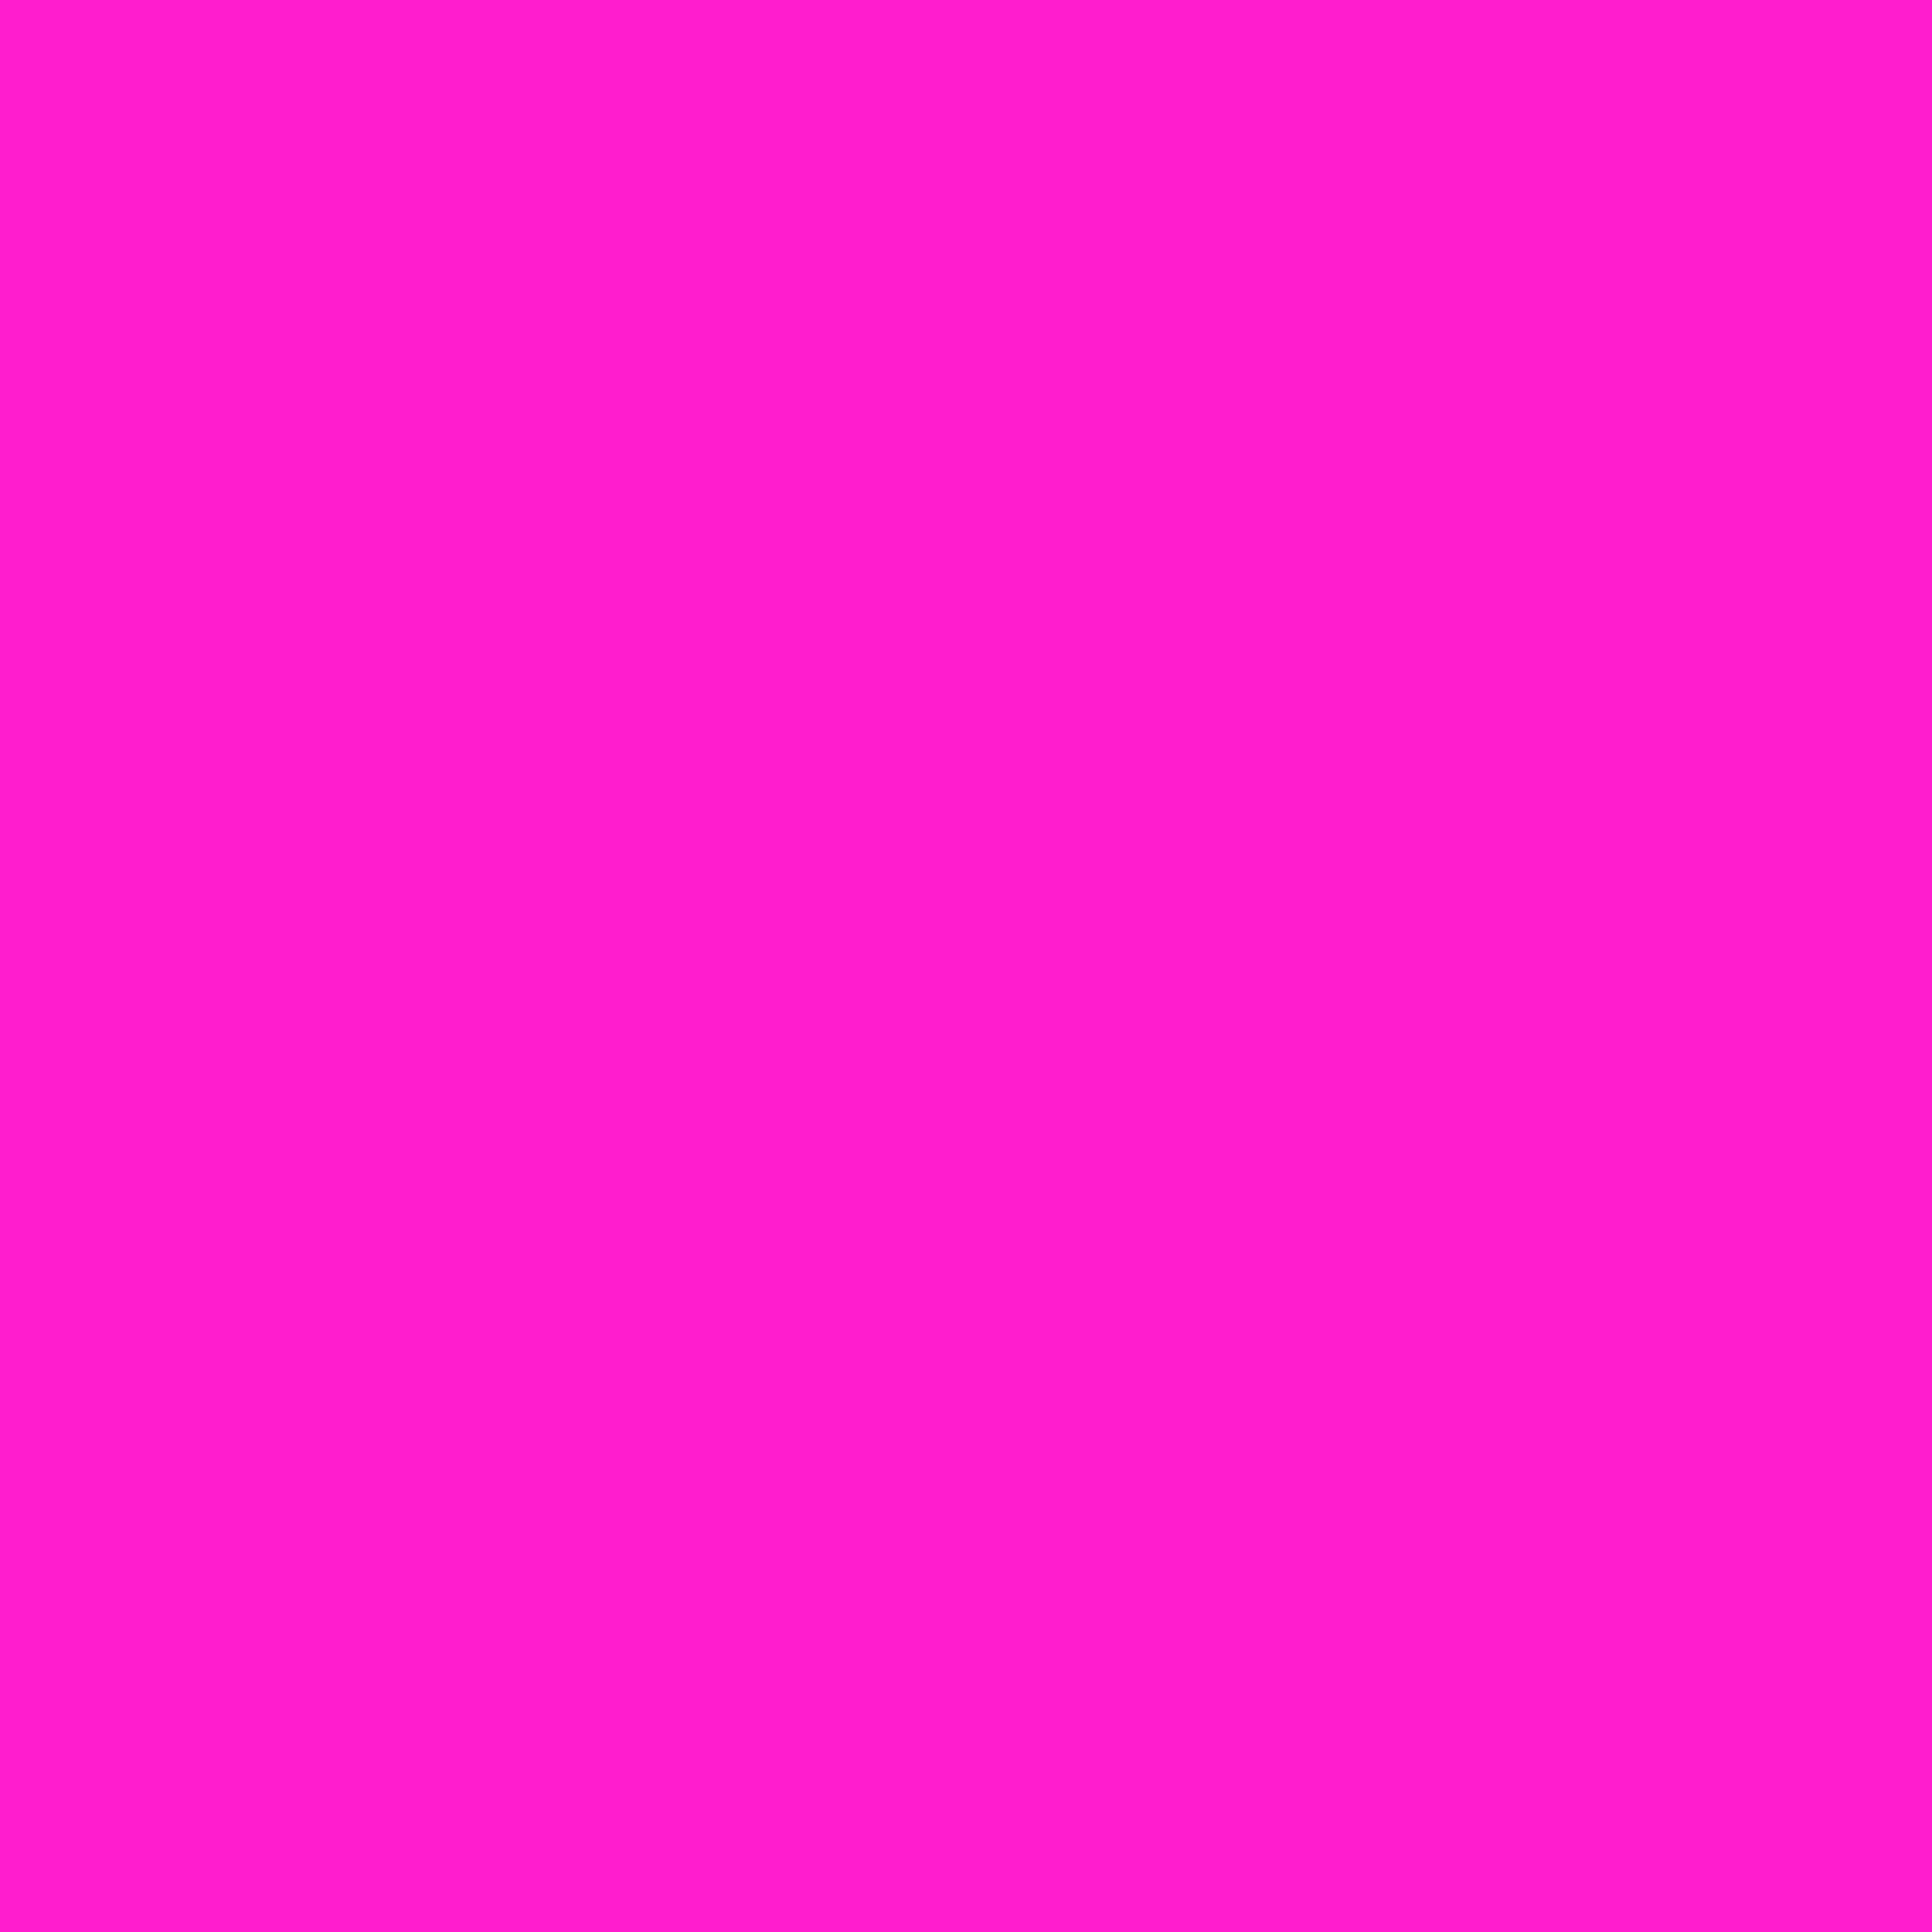 2048x2048 Hot Magenta Solid Color Background